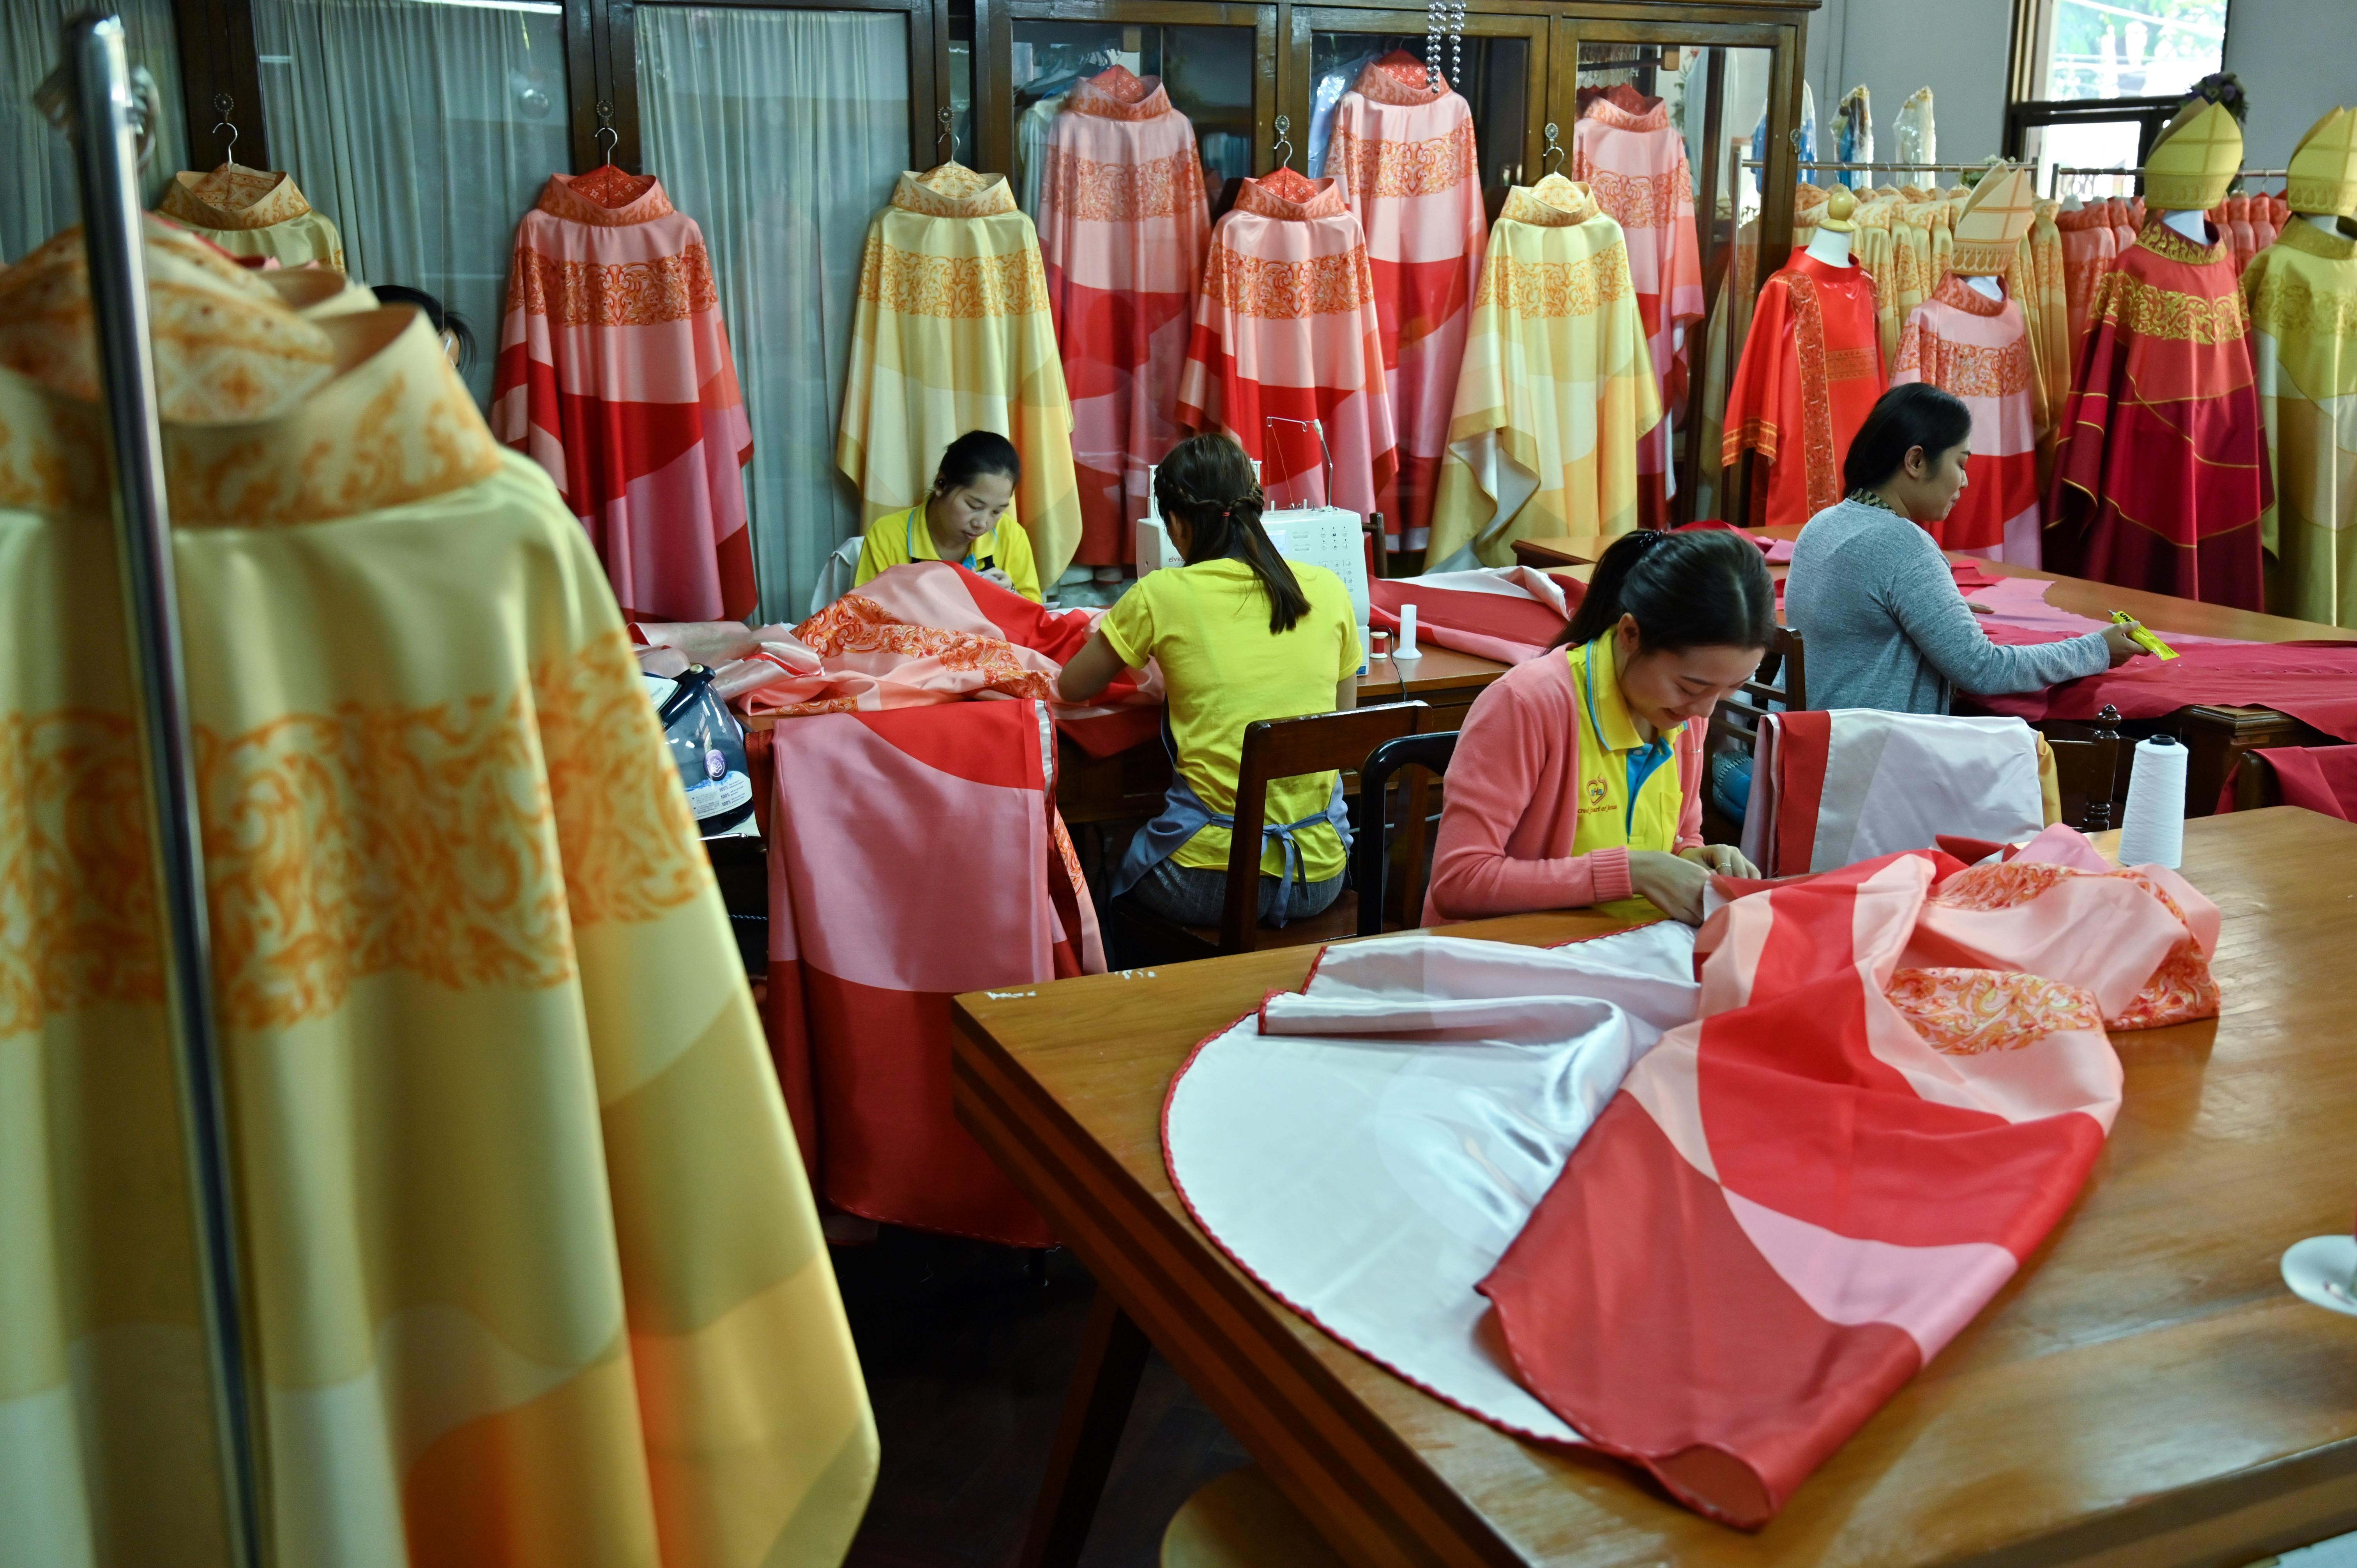 web2-pope-thailande-couture-afp-000_1m63l3.jpg